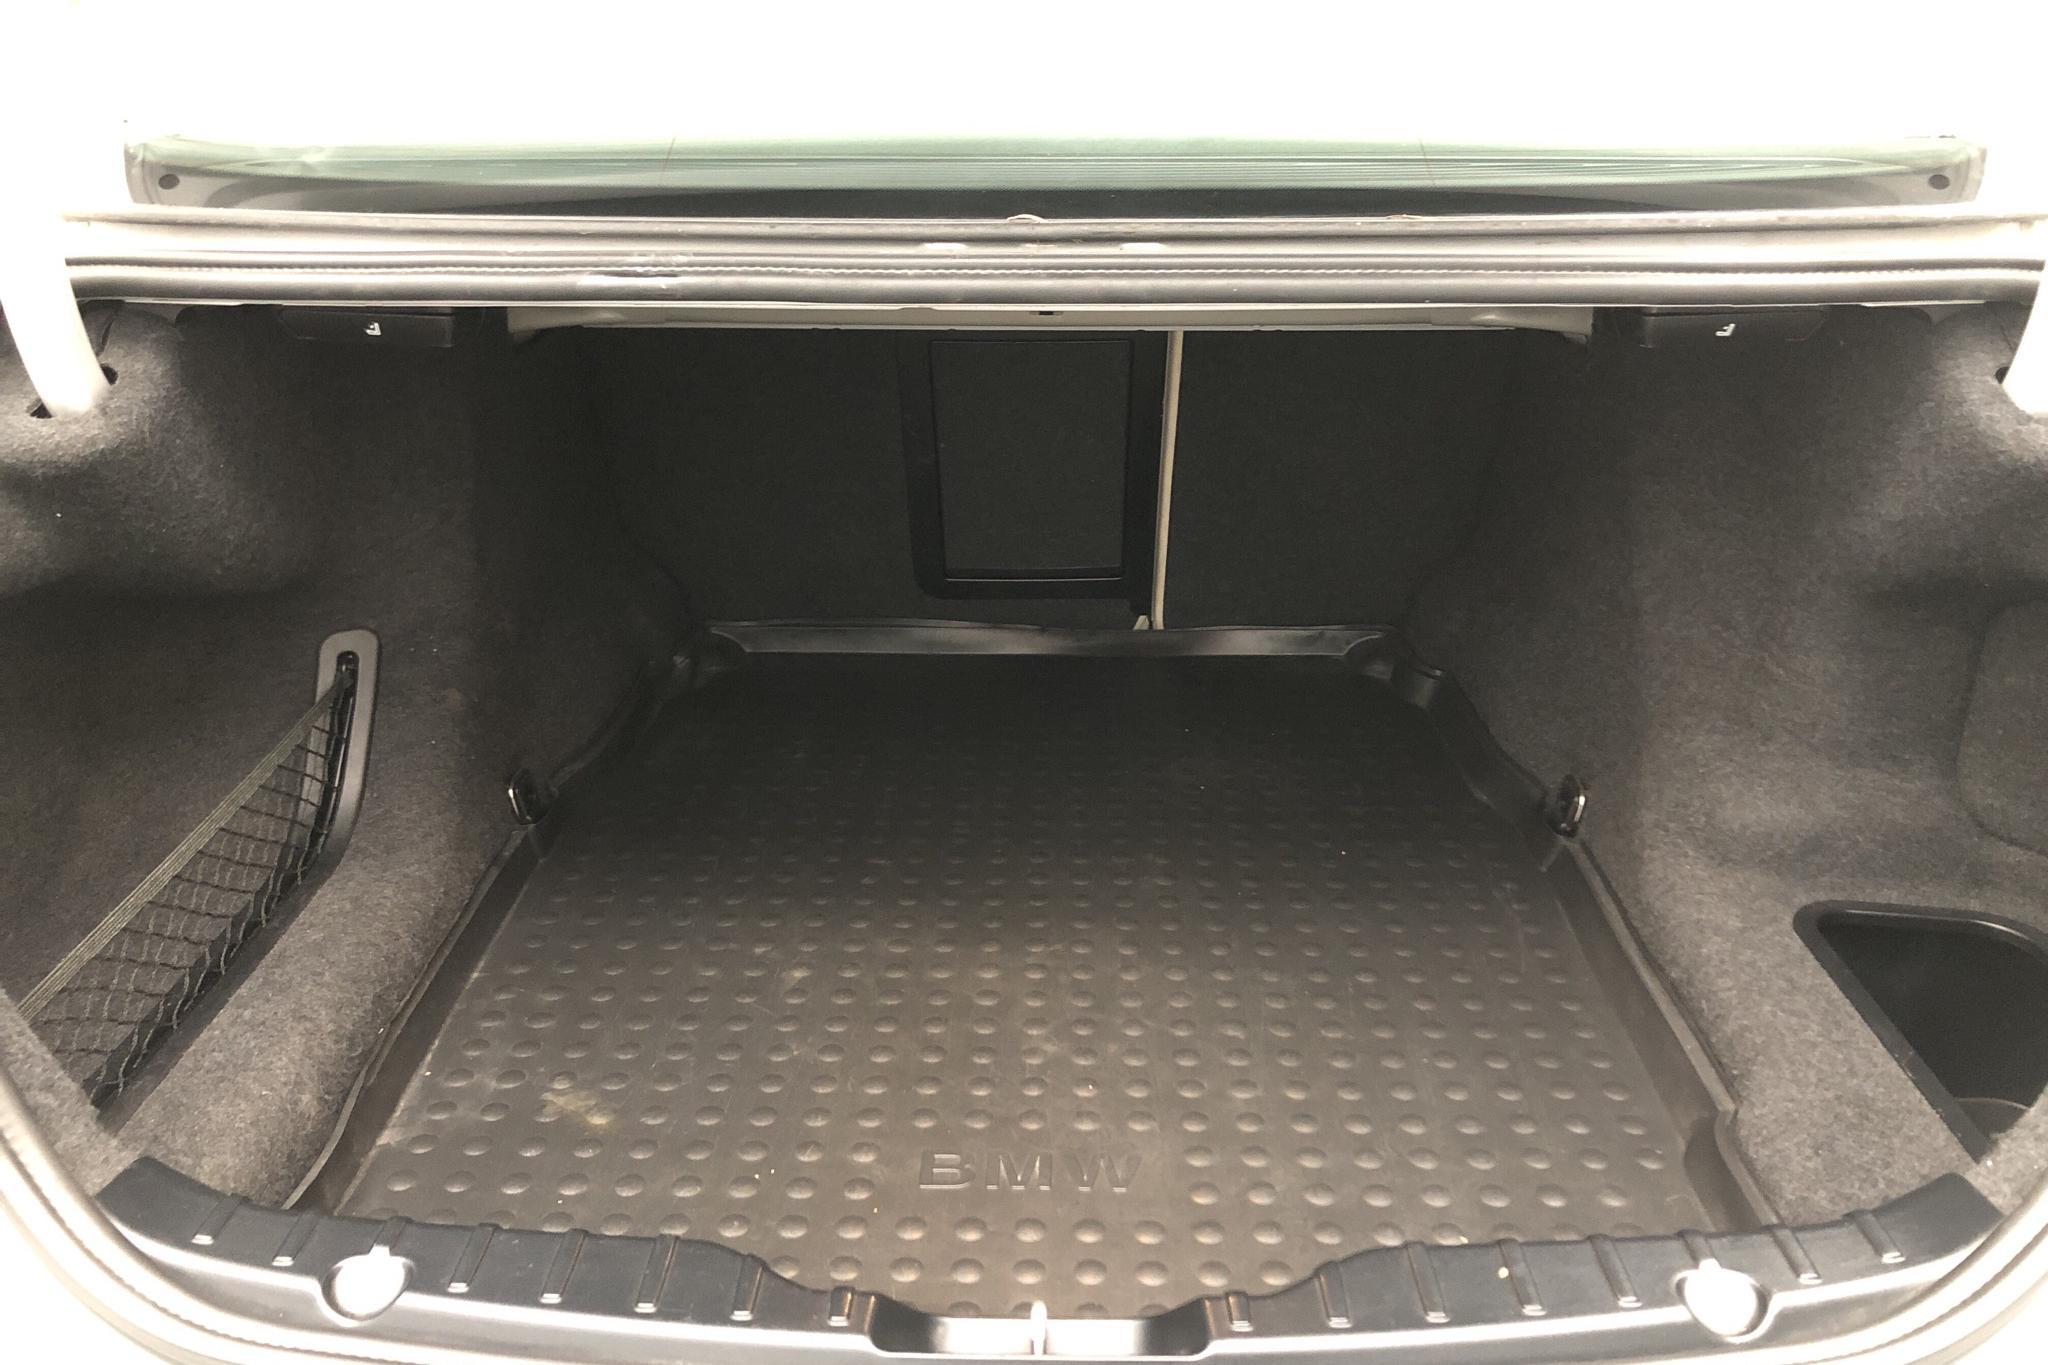 BMW 530d xDrive Sedan, F10 (258hk) - 10 504 mil - Automat - Light Grey - 2013